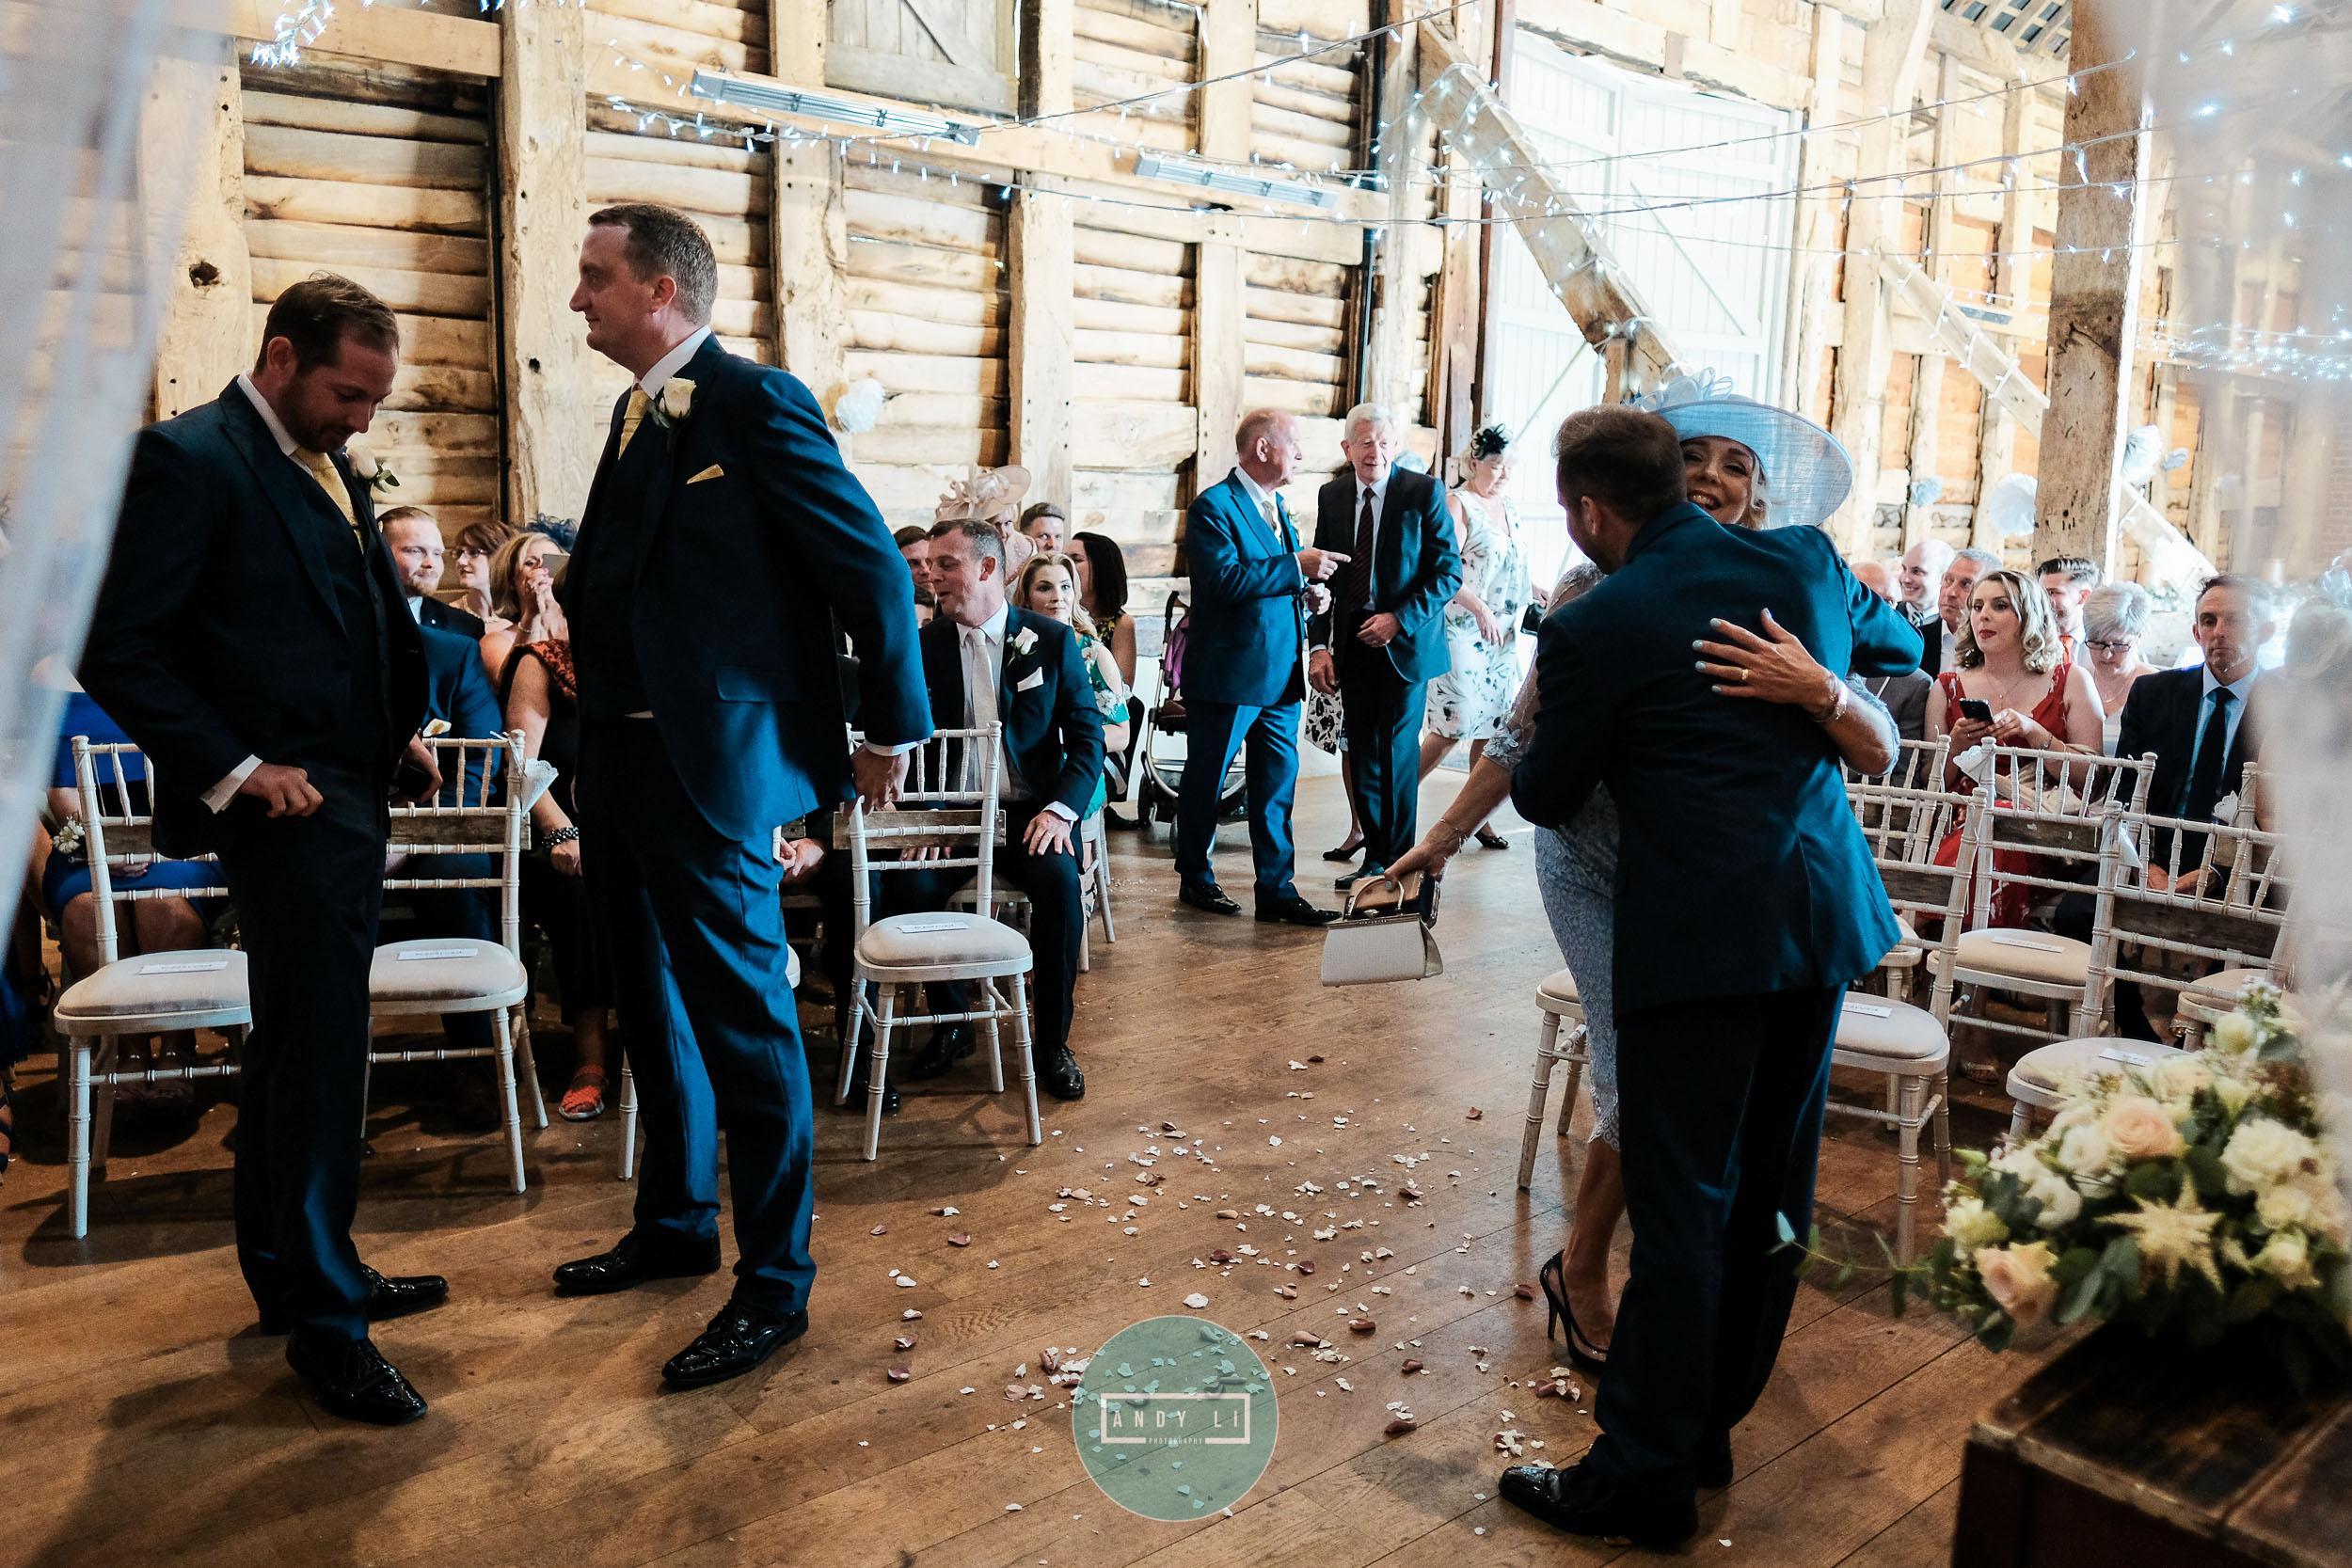 Pimhill Barn Wedding Photographer-046-XPRO6004.jpg